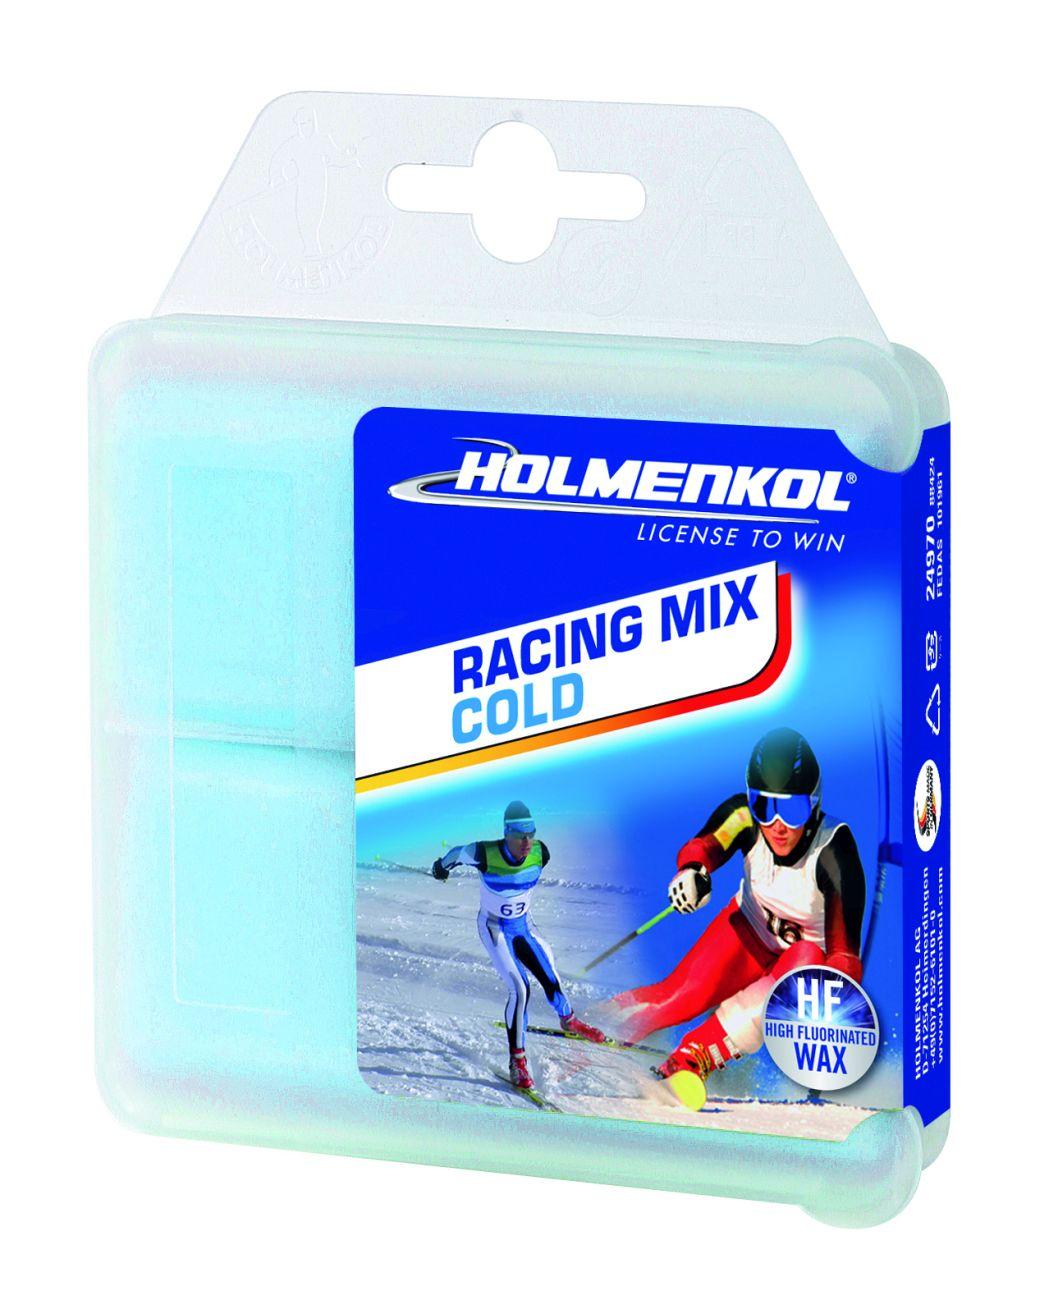 Holmenkol RacingMix Cold fluorvoks -10 - -18 C